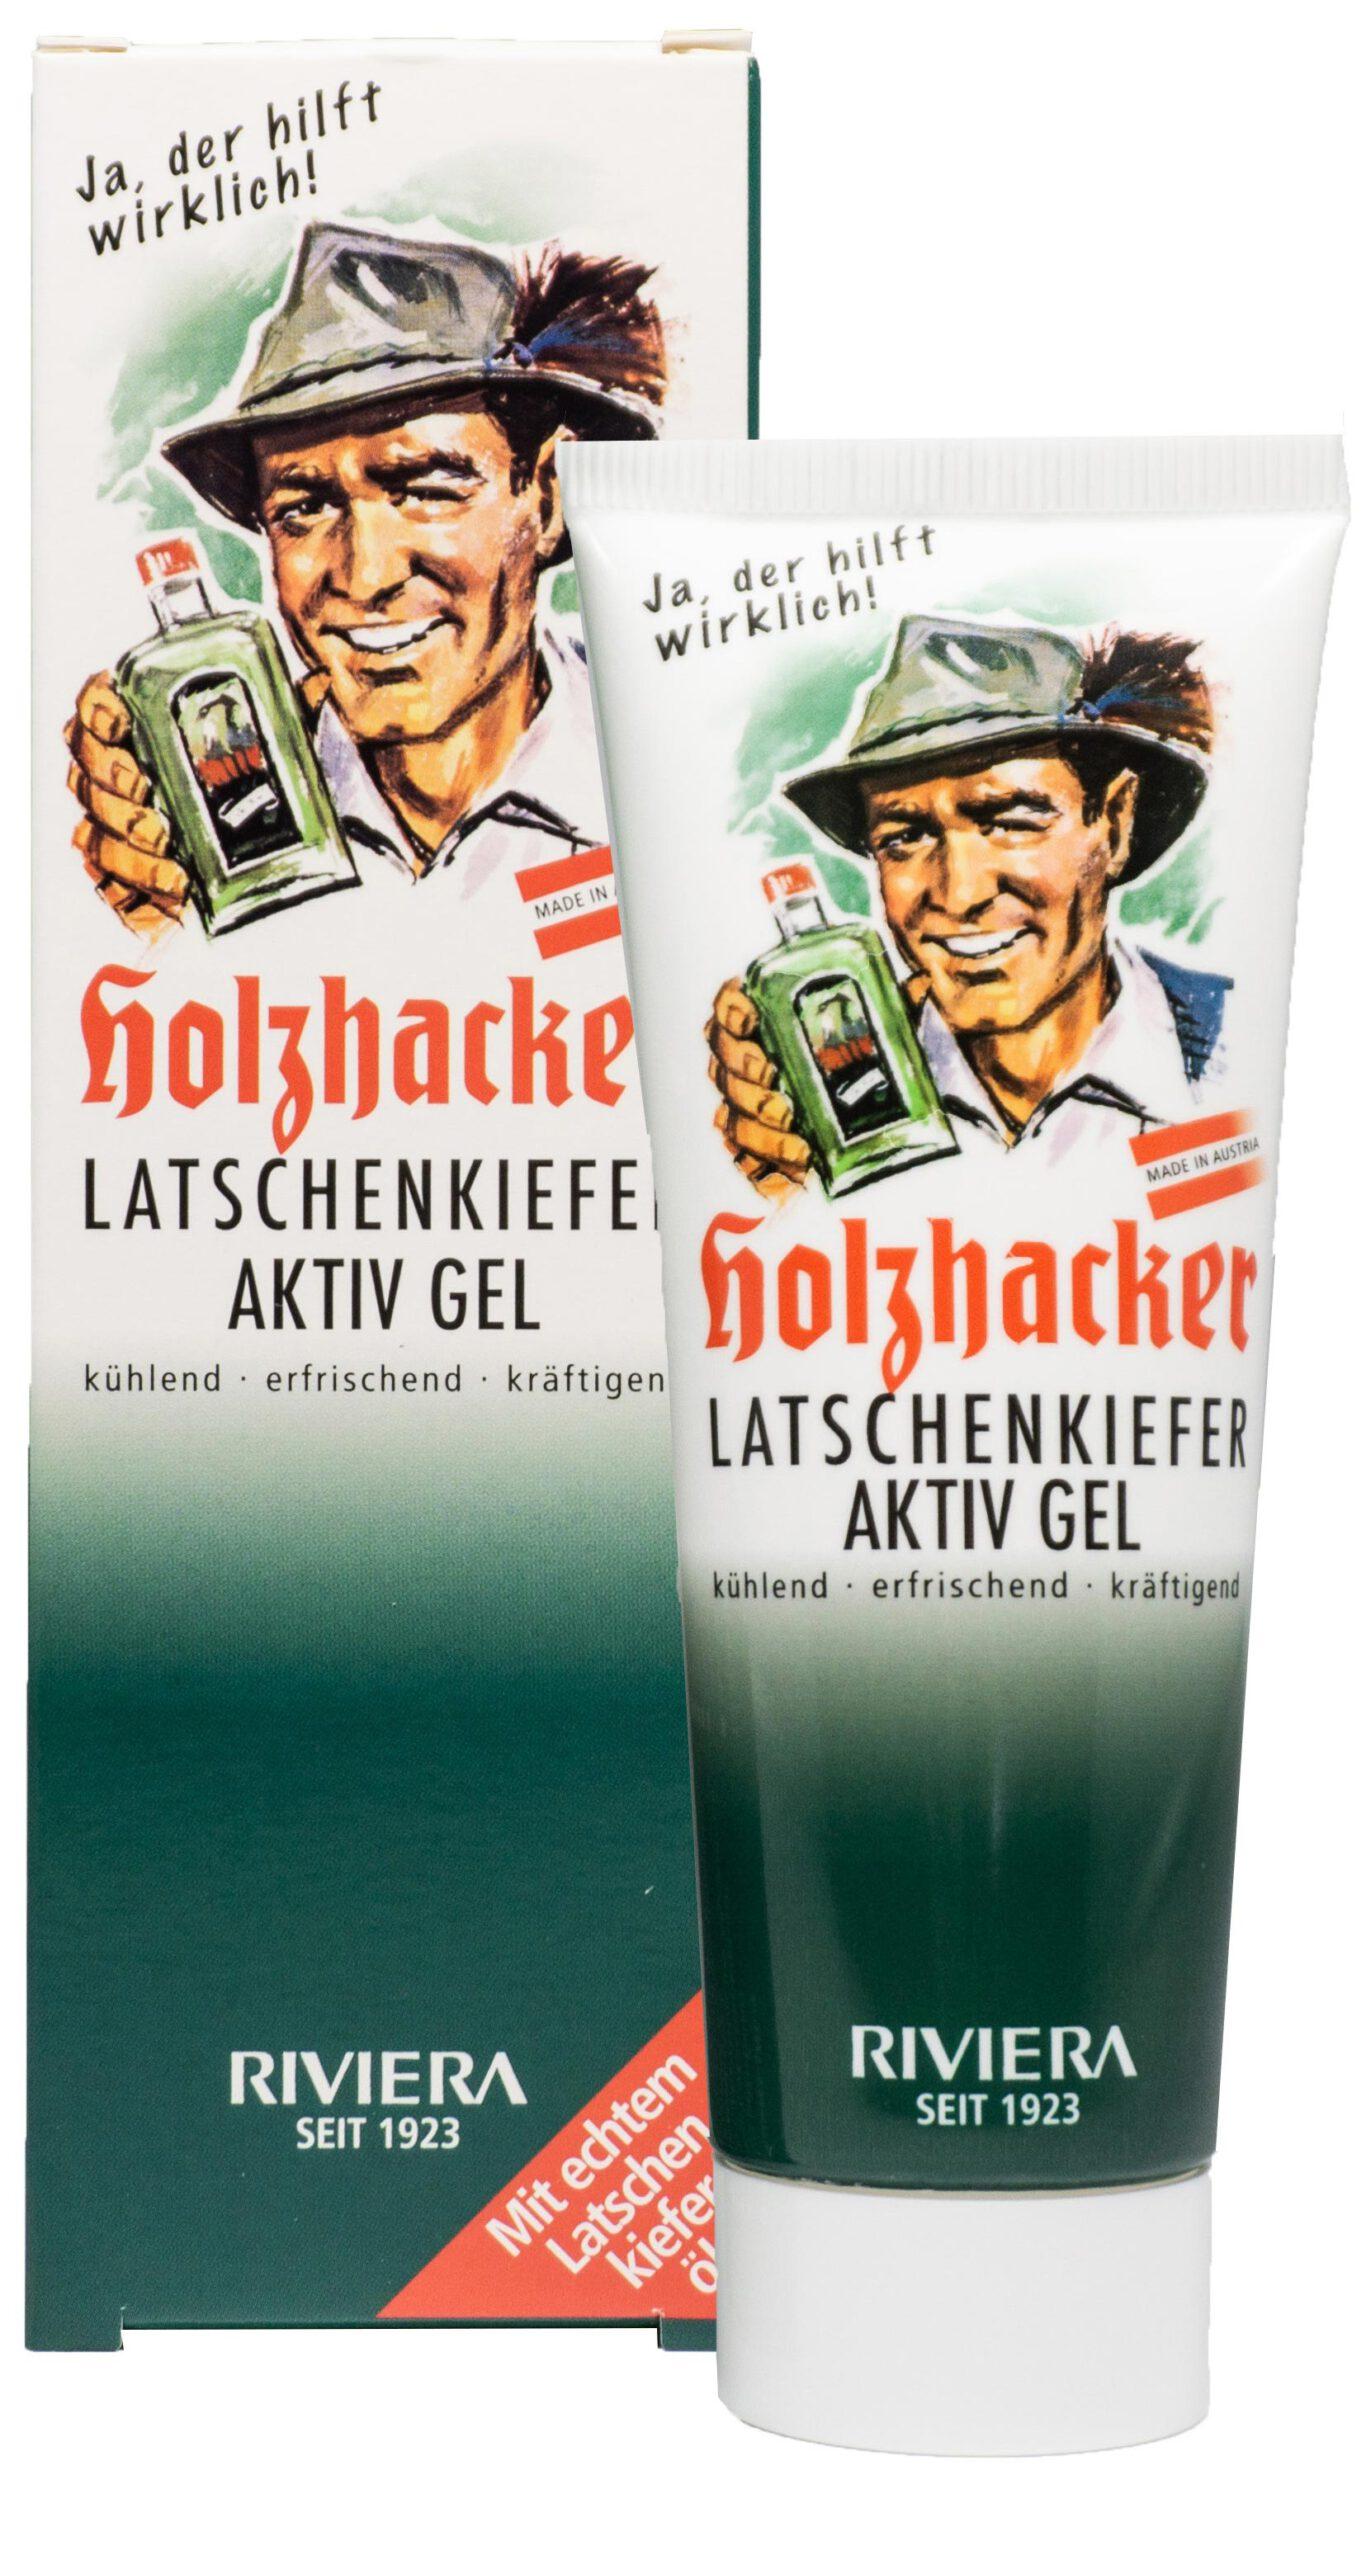 Holzhacker Latschenkiefer Aktiv Gel Image